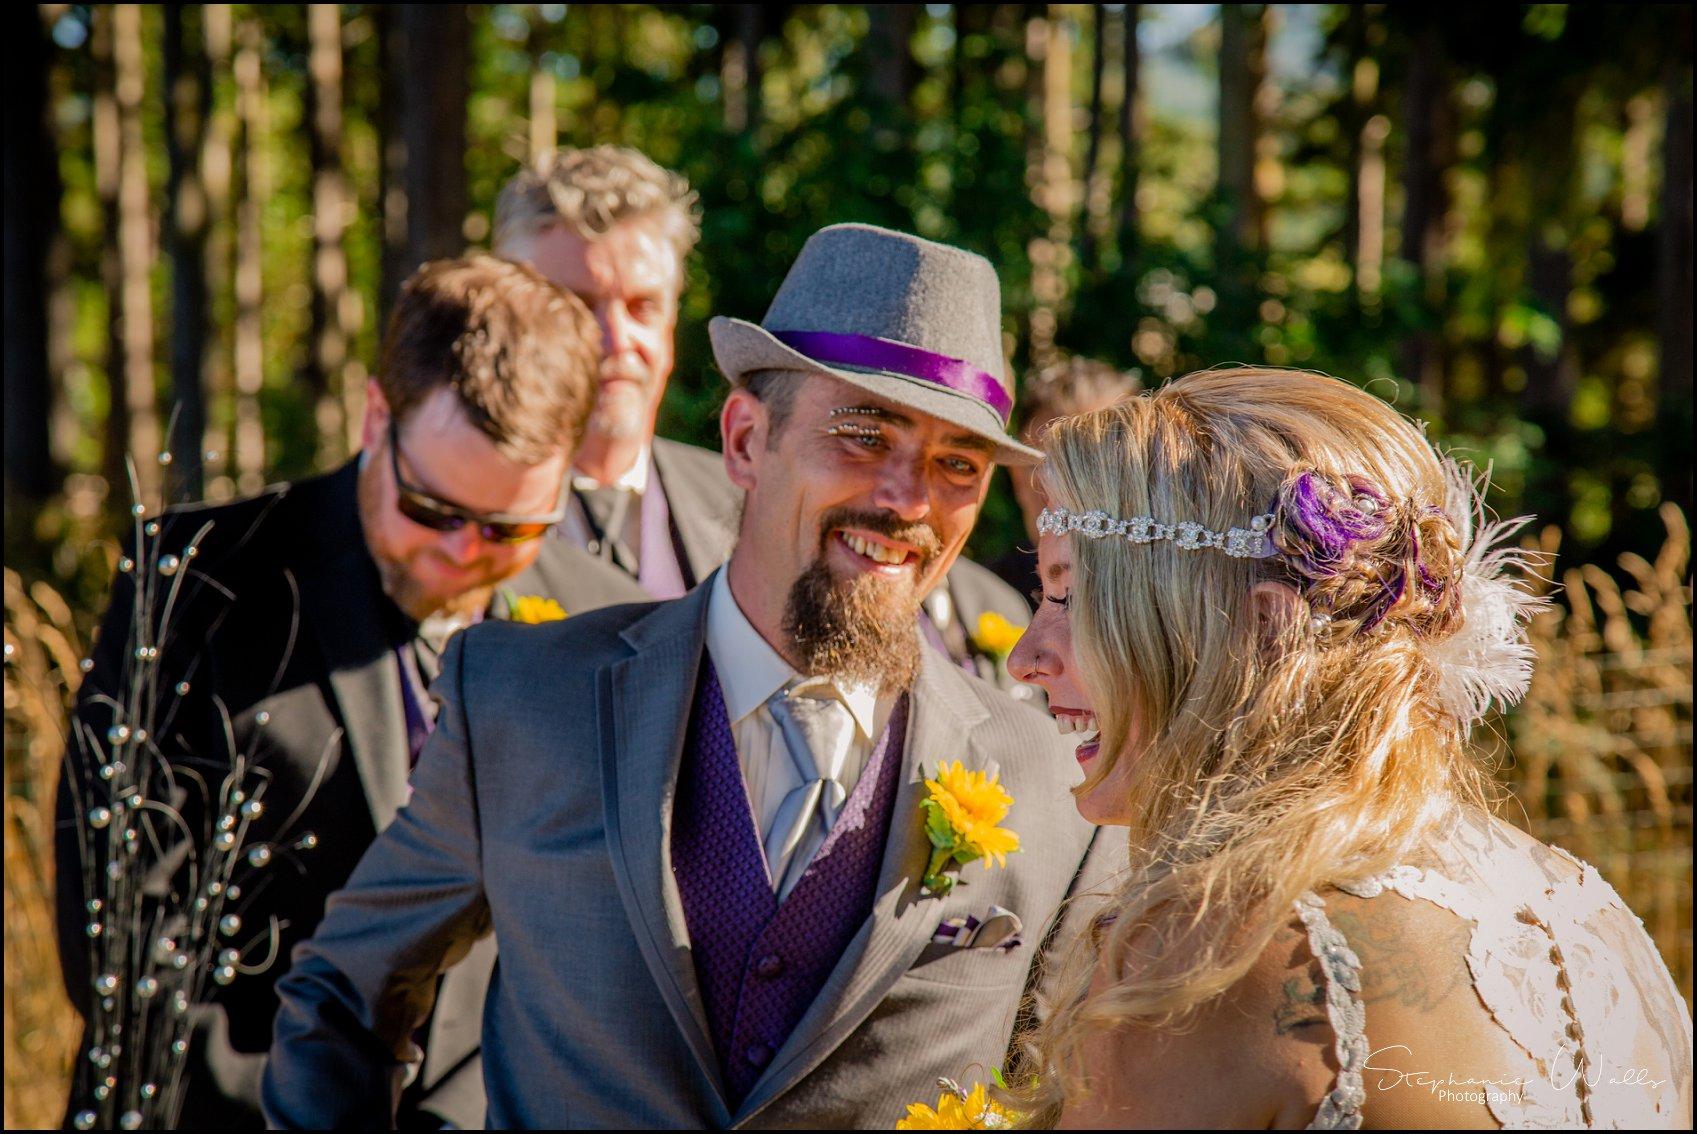 Everist Wedding 168 Patti & Bobbys | Troll Haven Castle & Bandy Farms | Sequim, Wa Wedding Photographer